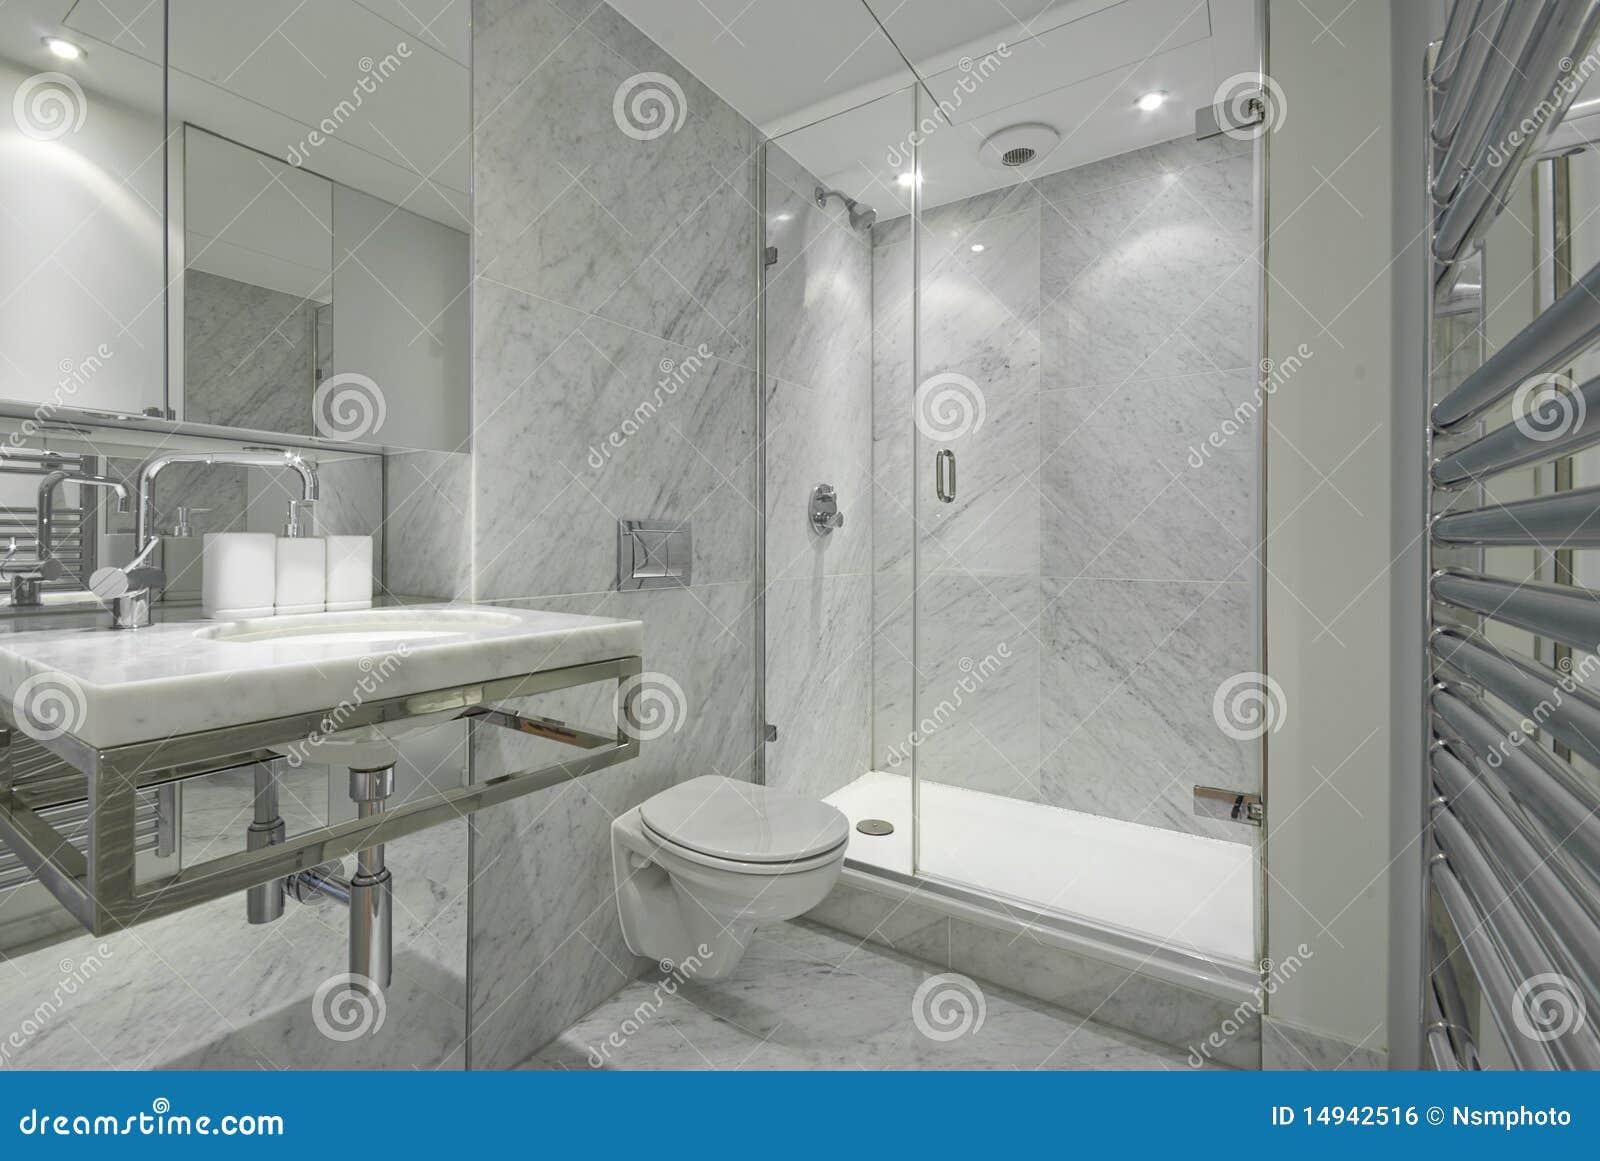 Moderne engelse reeks marmeren badkamers in wit royalty vrije stock afbeelding afbeelding for Moderne badkamers